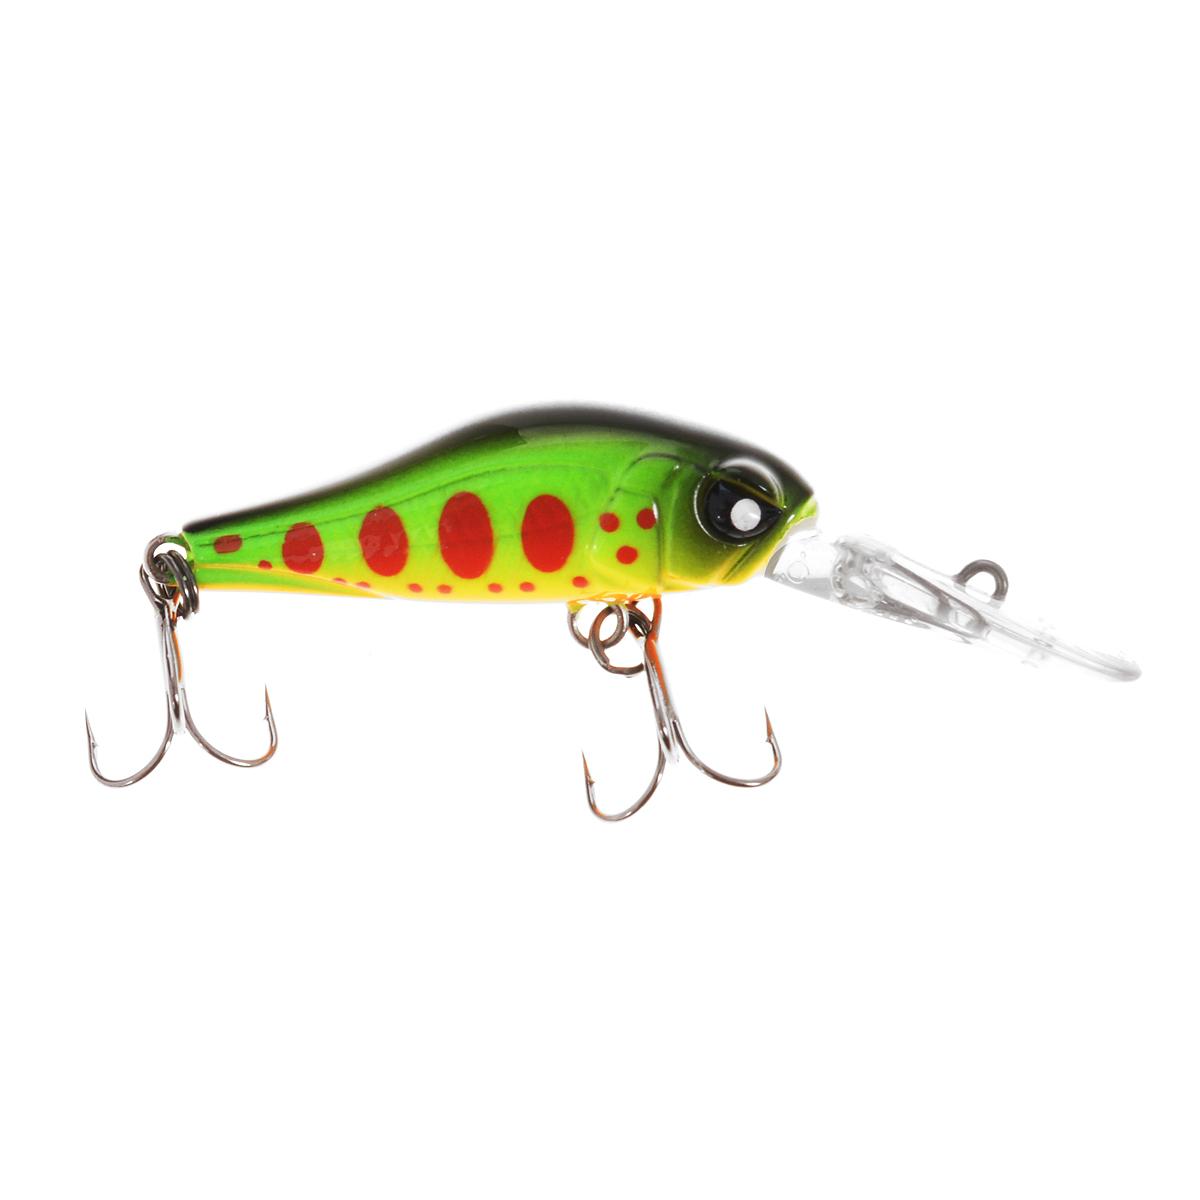 Воблер плавающий Lucky John Basara, цвет: зеленый, желтый, красный, 3,5 см, 2 г воблер плавающий lucky john haira tiny shallow pilot цвет желтый черный белый 3 3 см 4 г